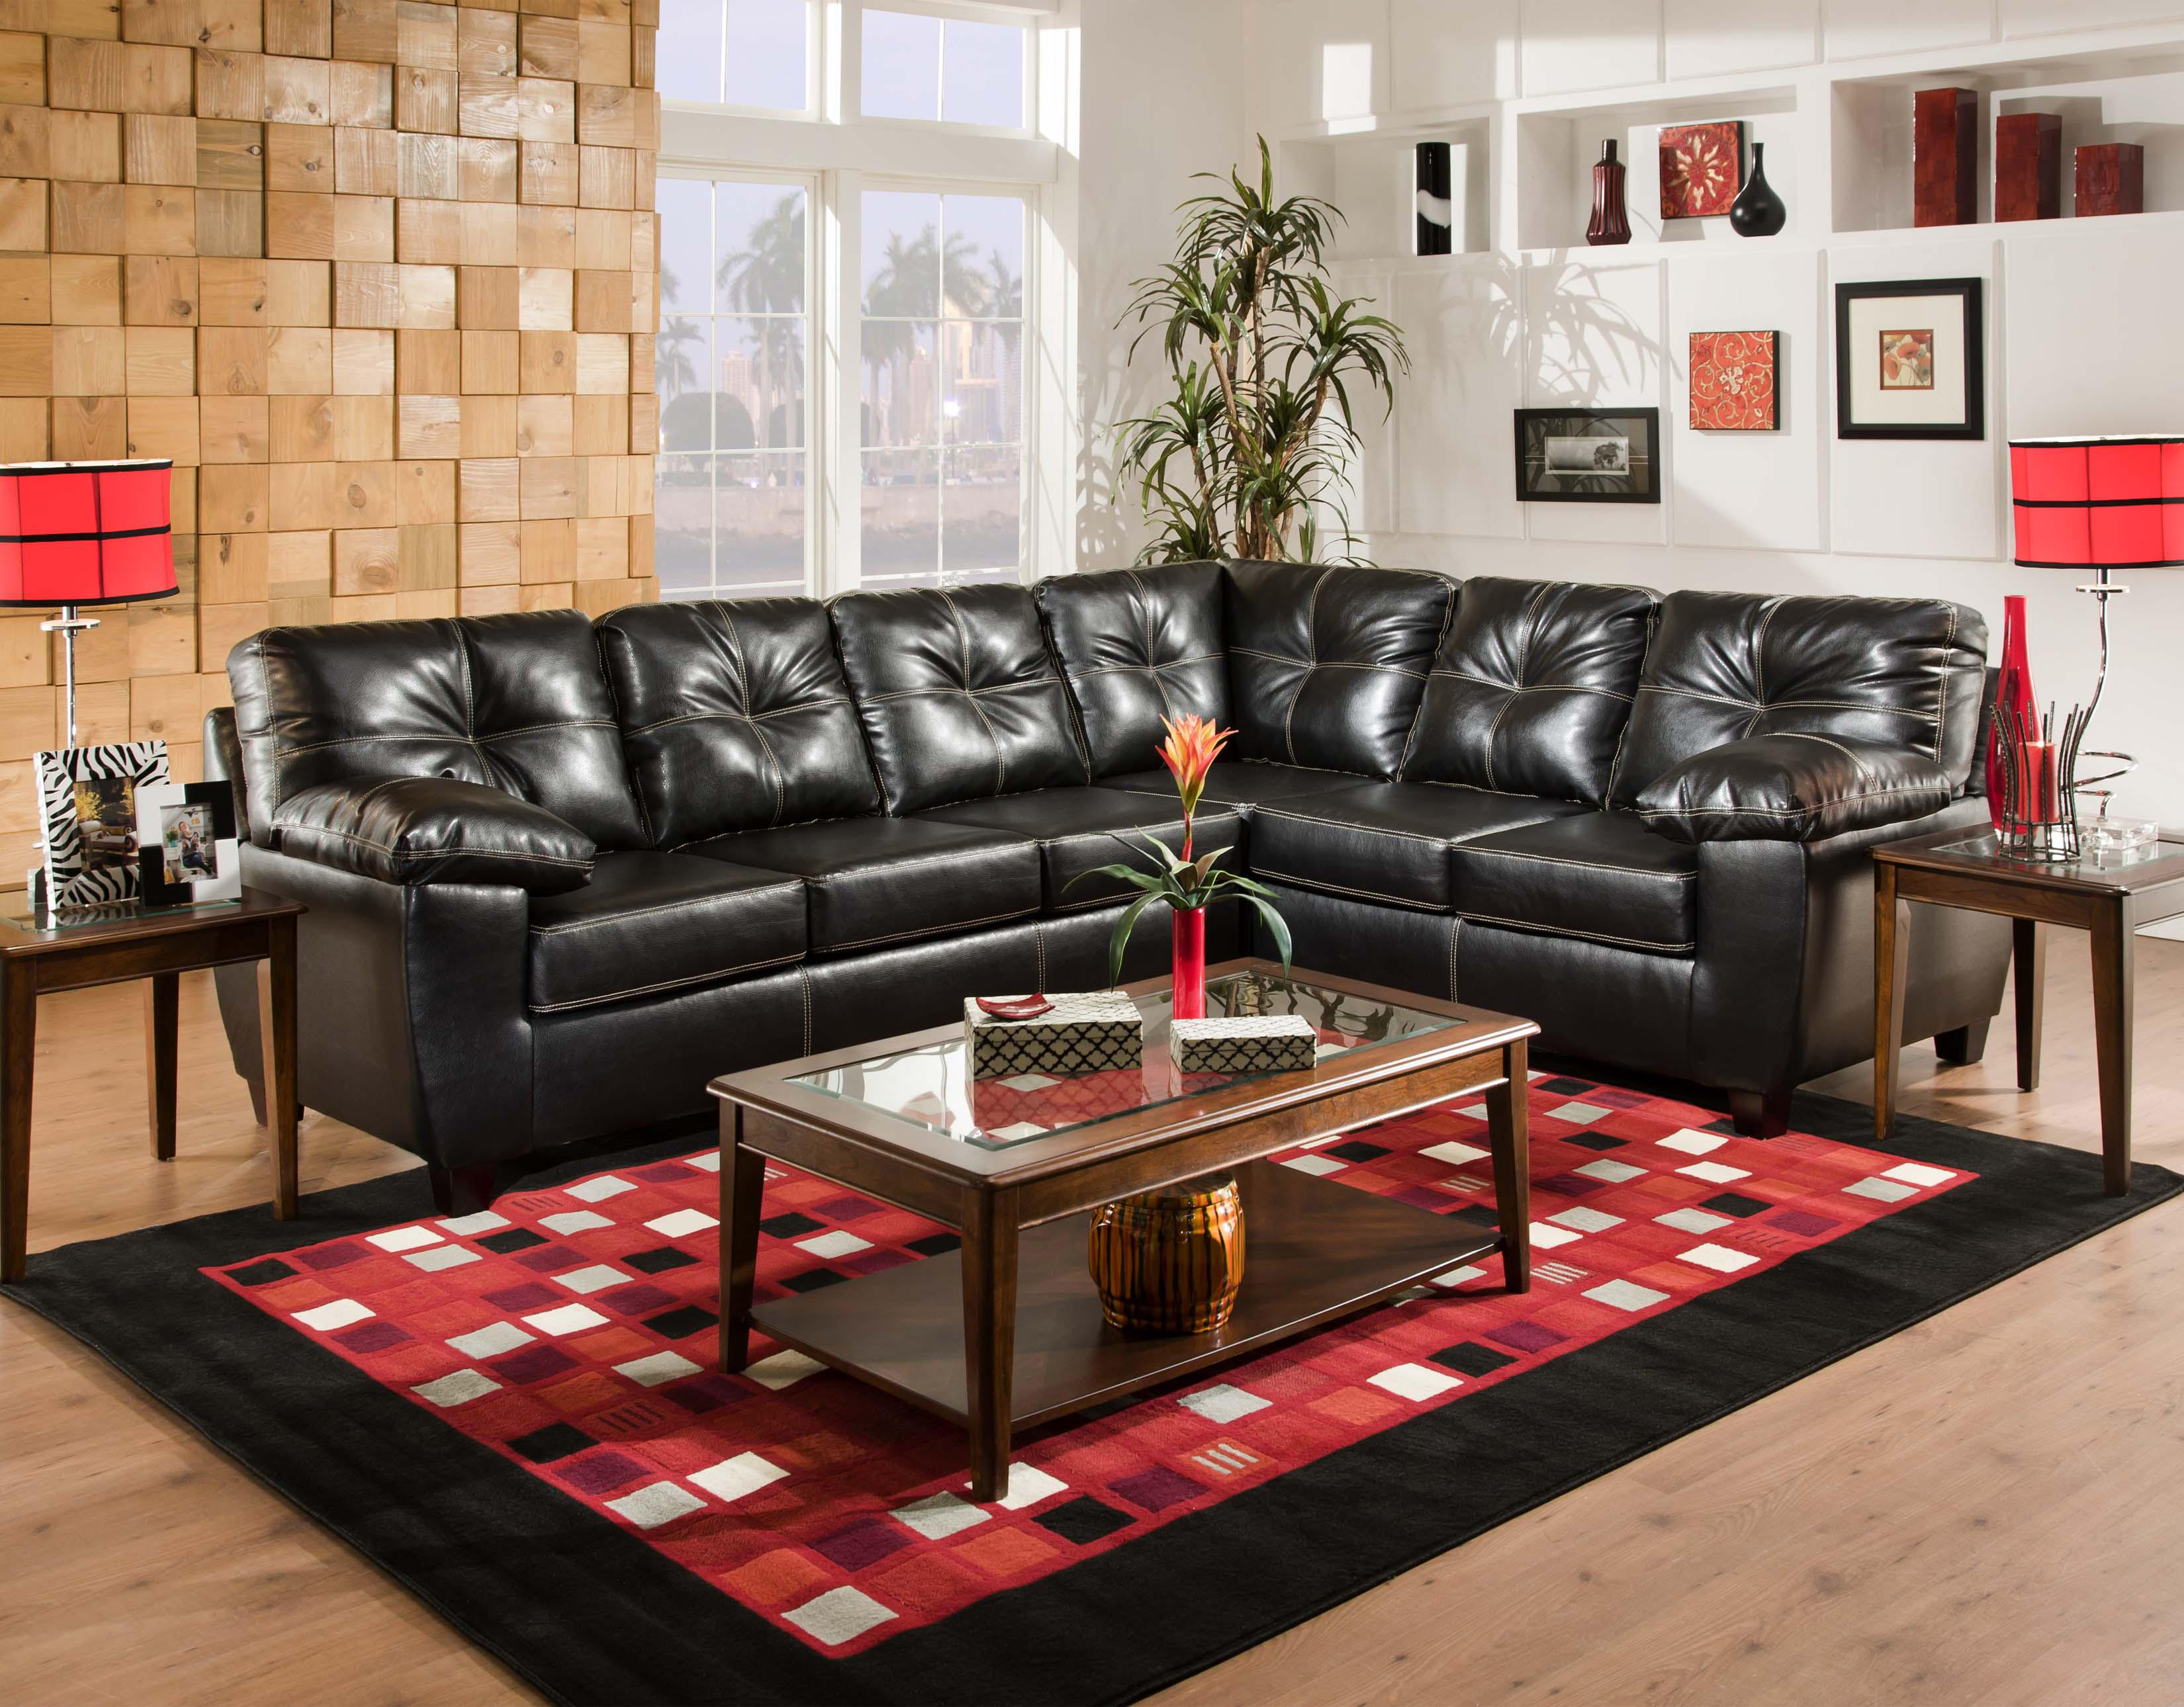 American Furniture 1470  Sectional Sofa - Item Number: 1471+1472 4111